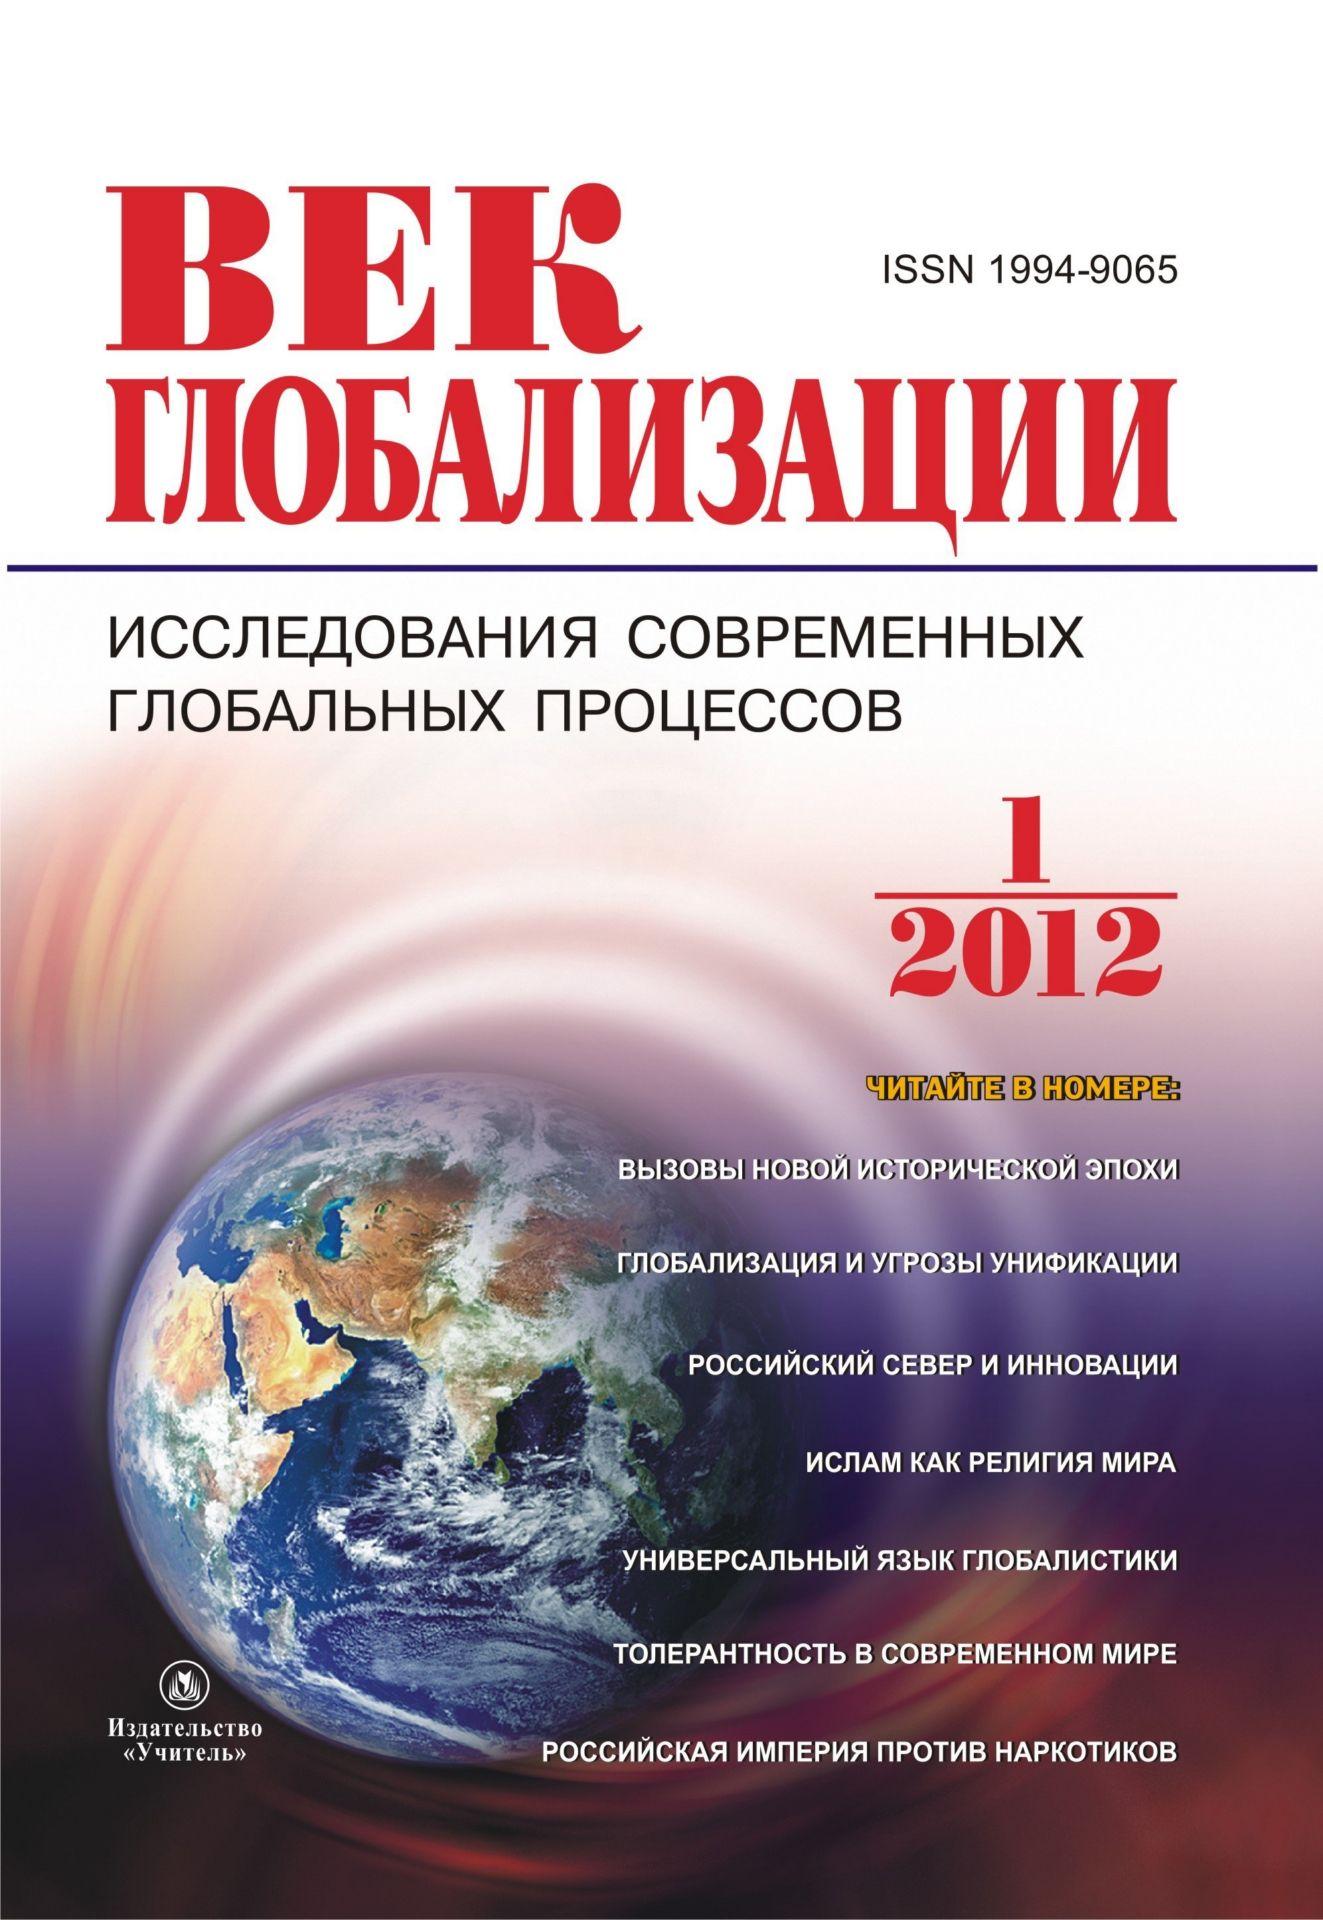 "Журнал ""Век глобализации"" № 1 2012"